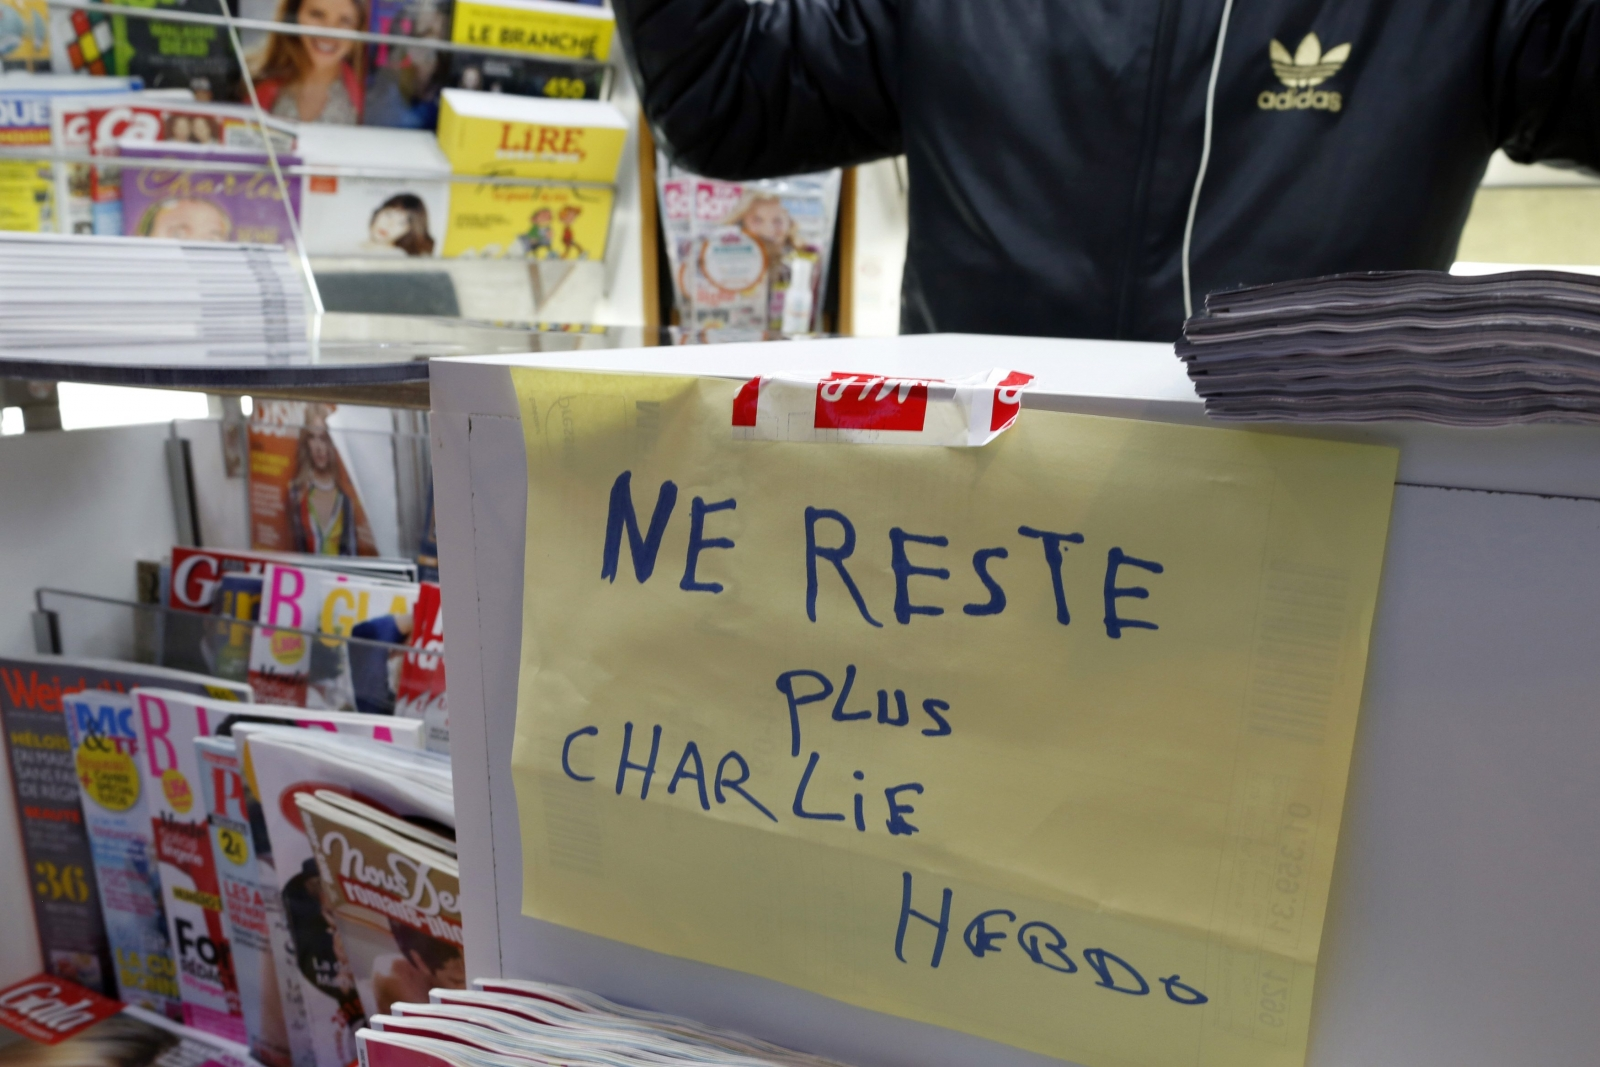 Parisians flock to buy new issue of Charlie Hebdo